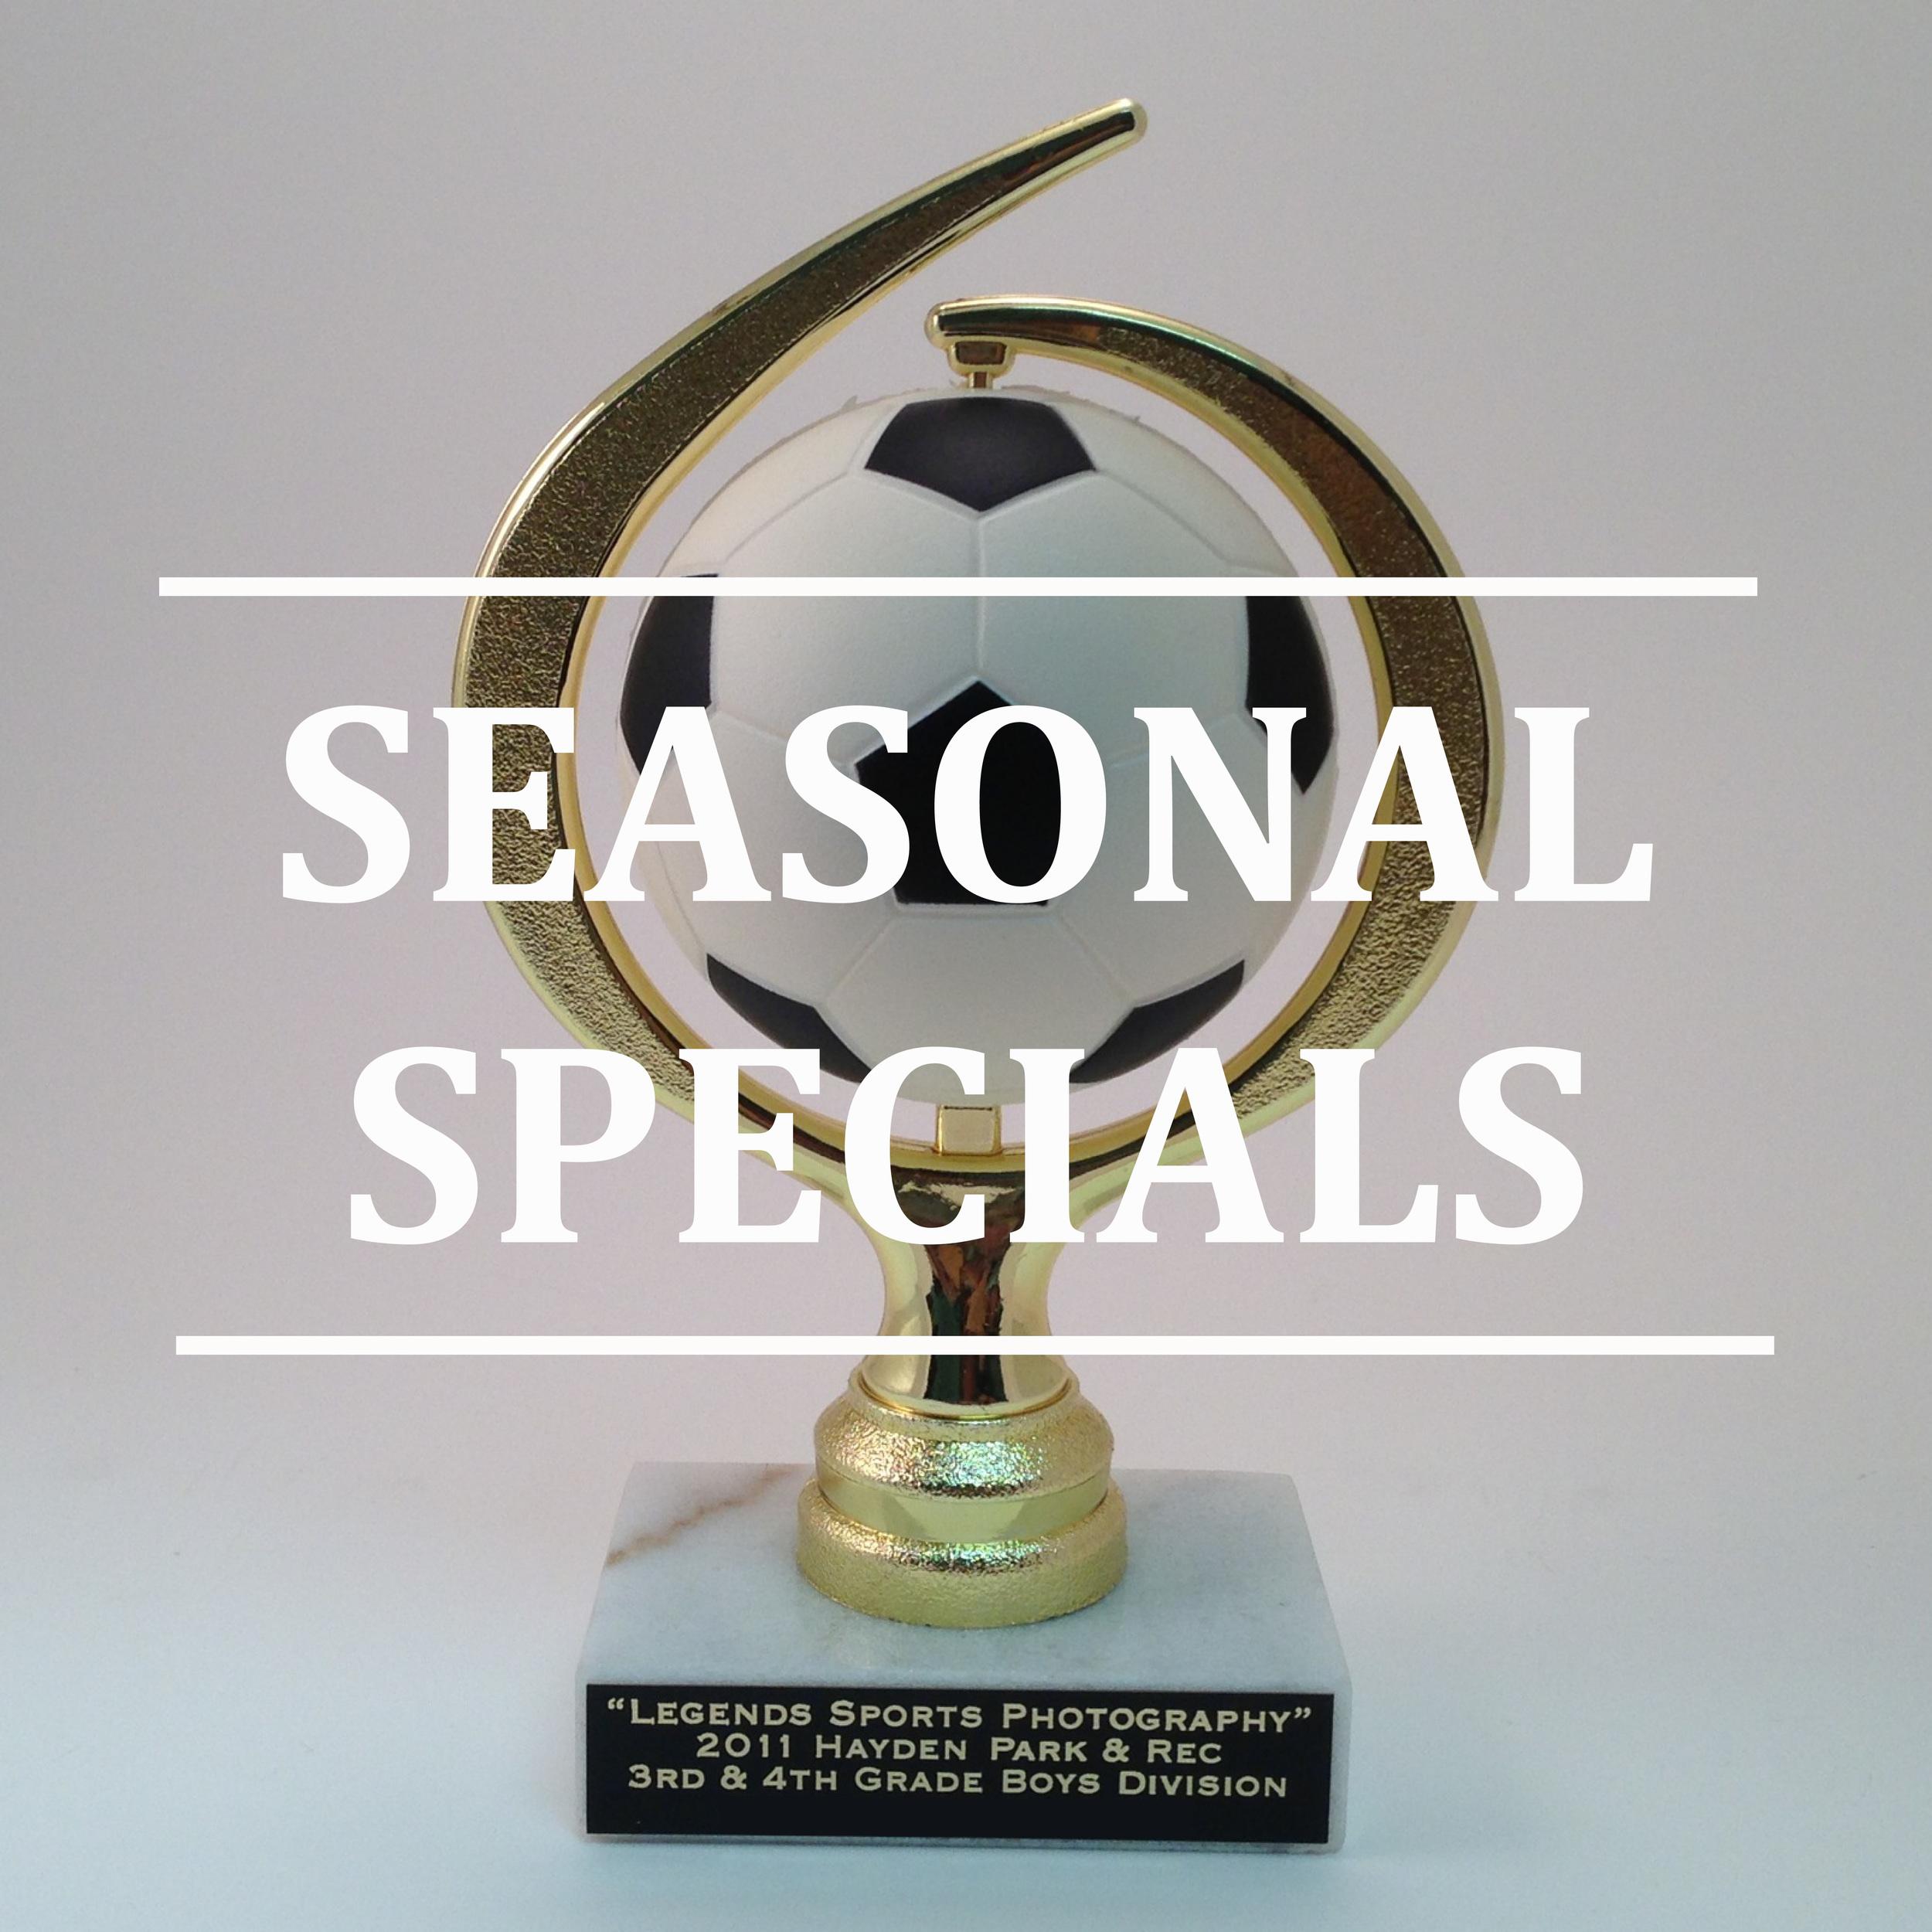 Seasonal Sports Specials